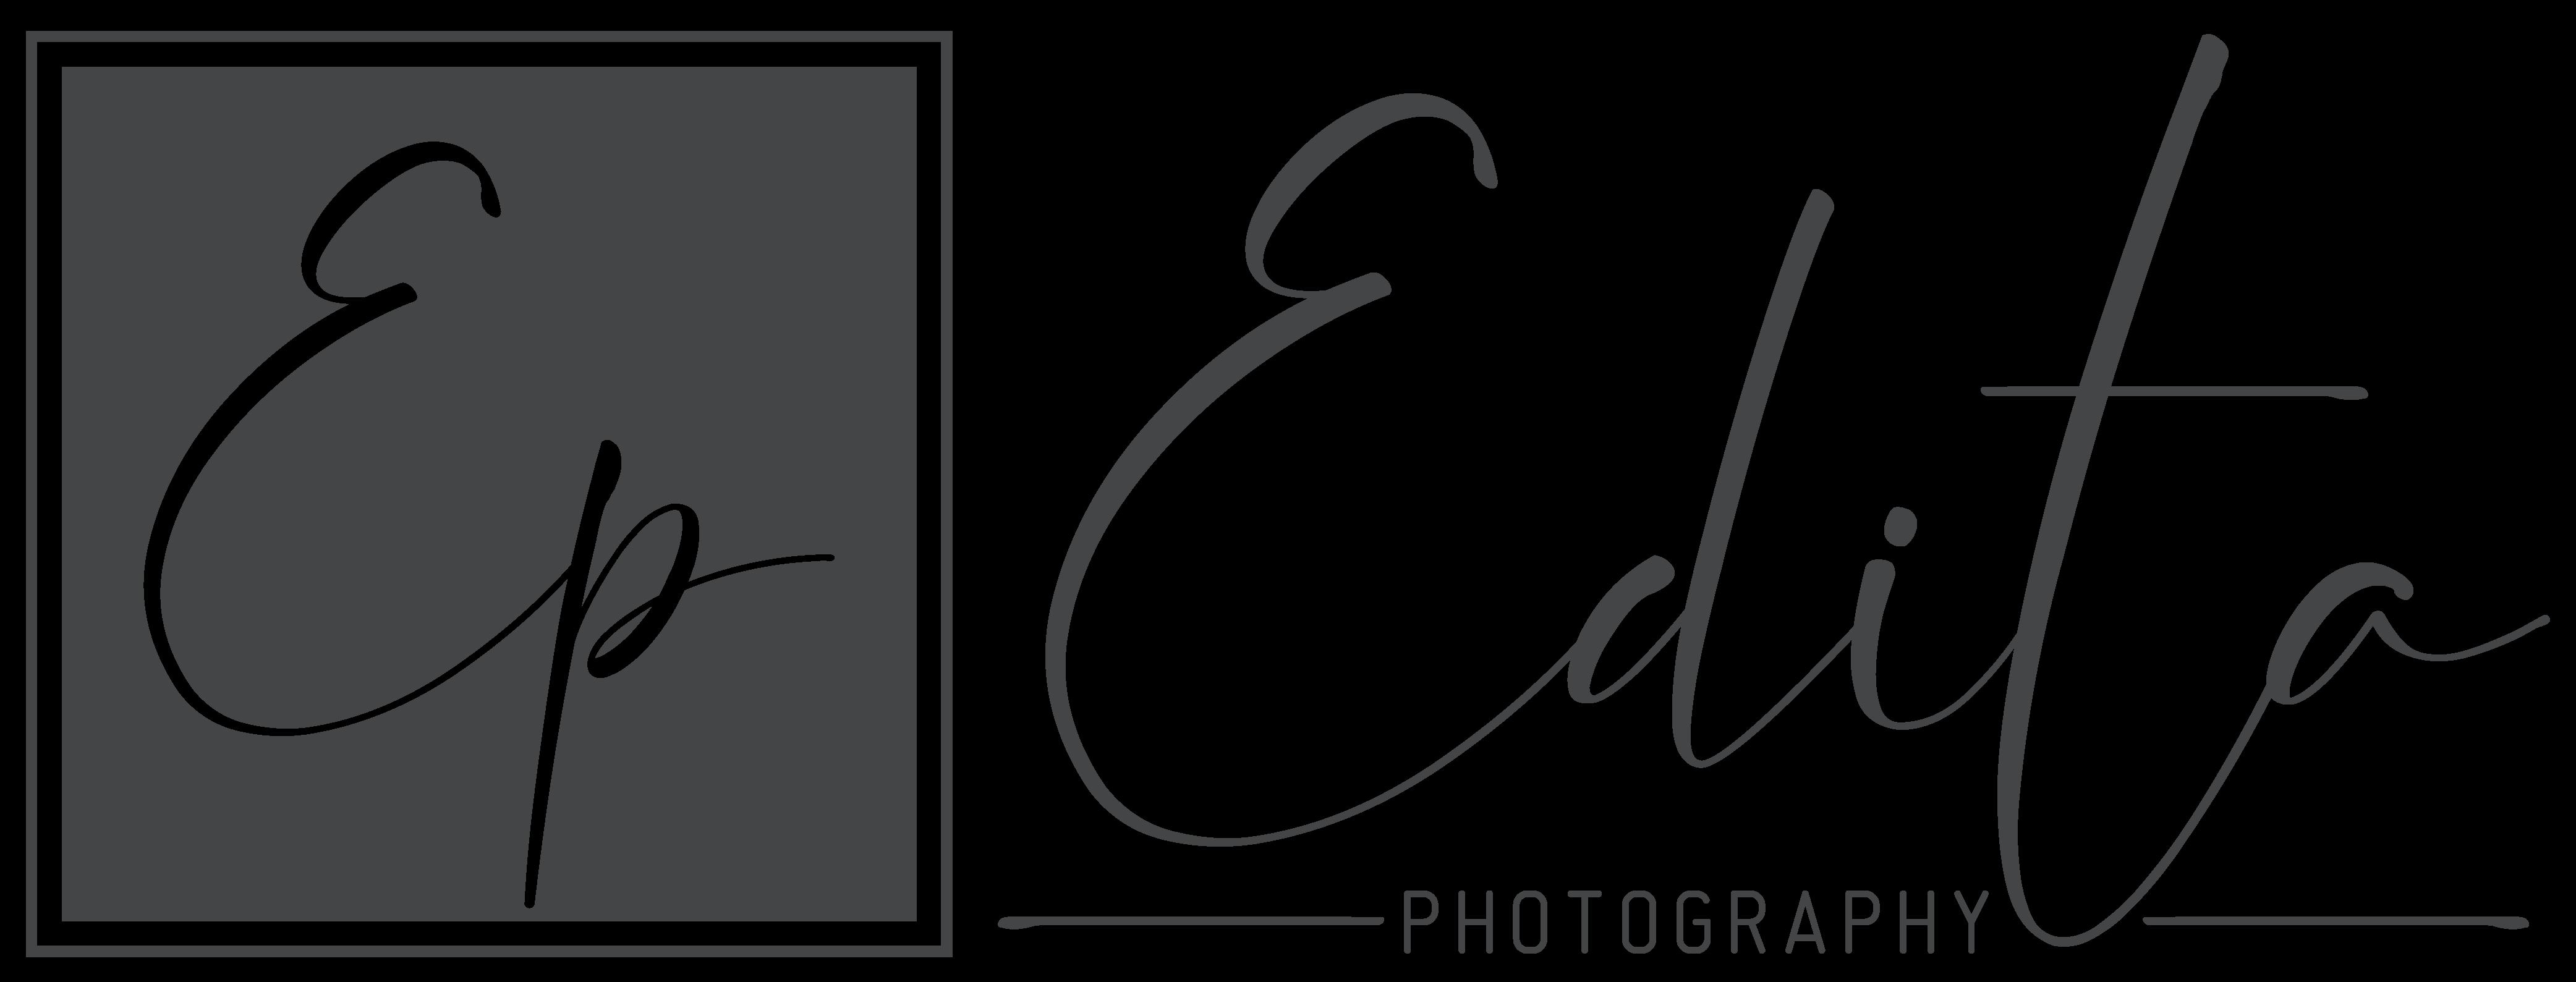 Edita photography logo